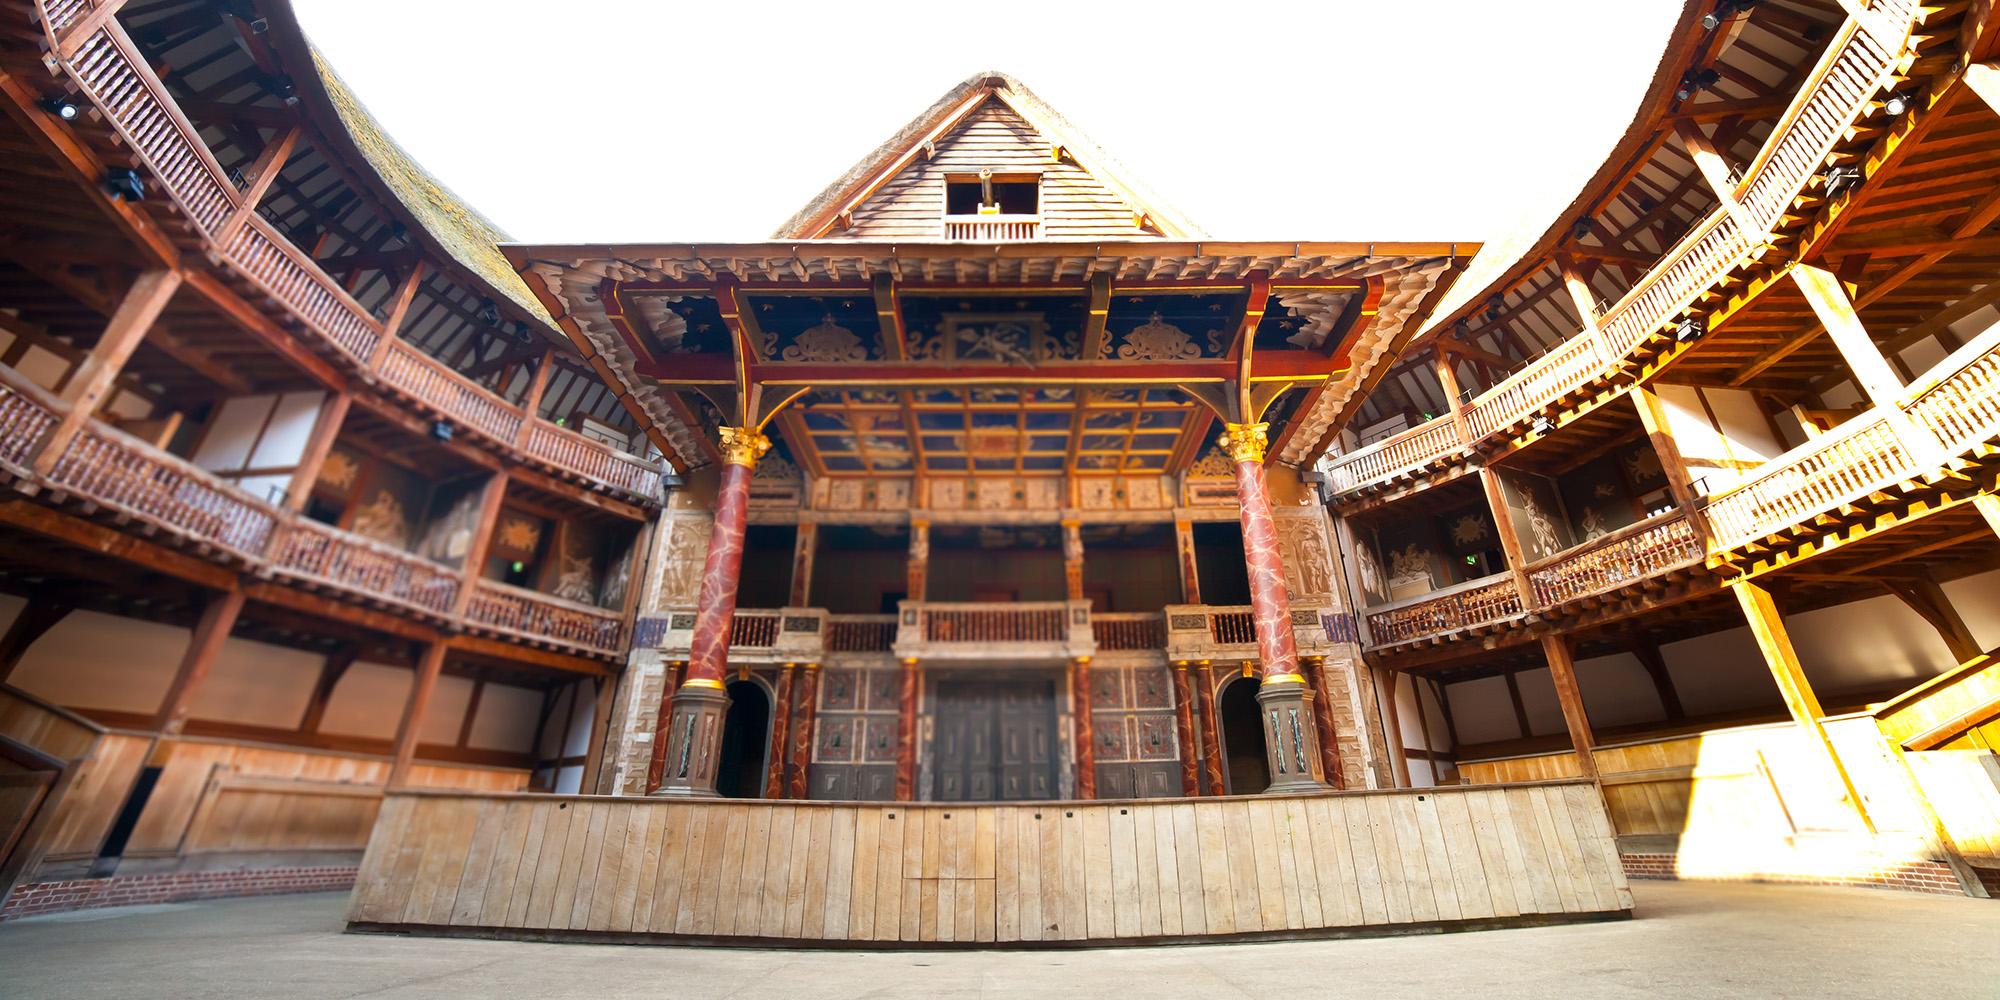 Interior shot of a wooden circular theatre, looking upwards.